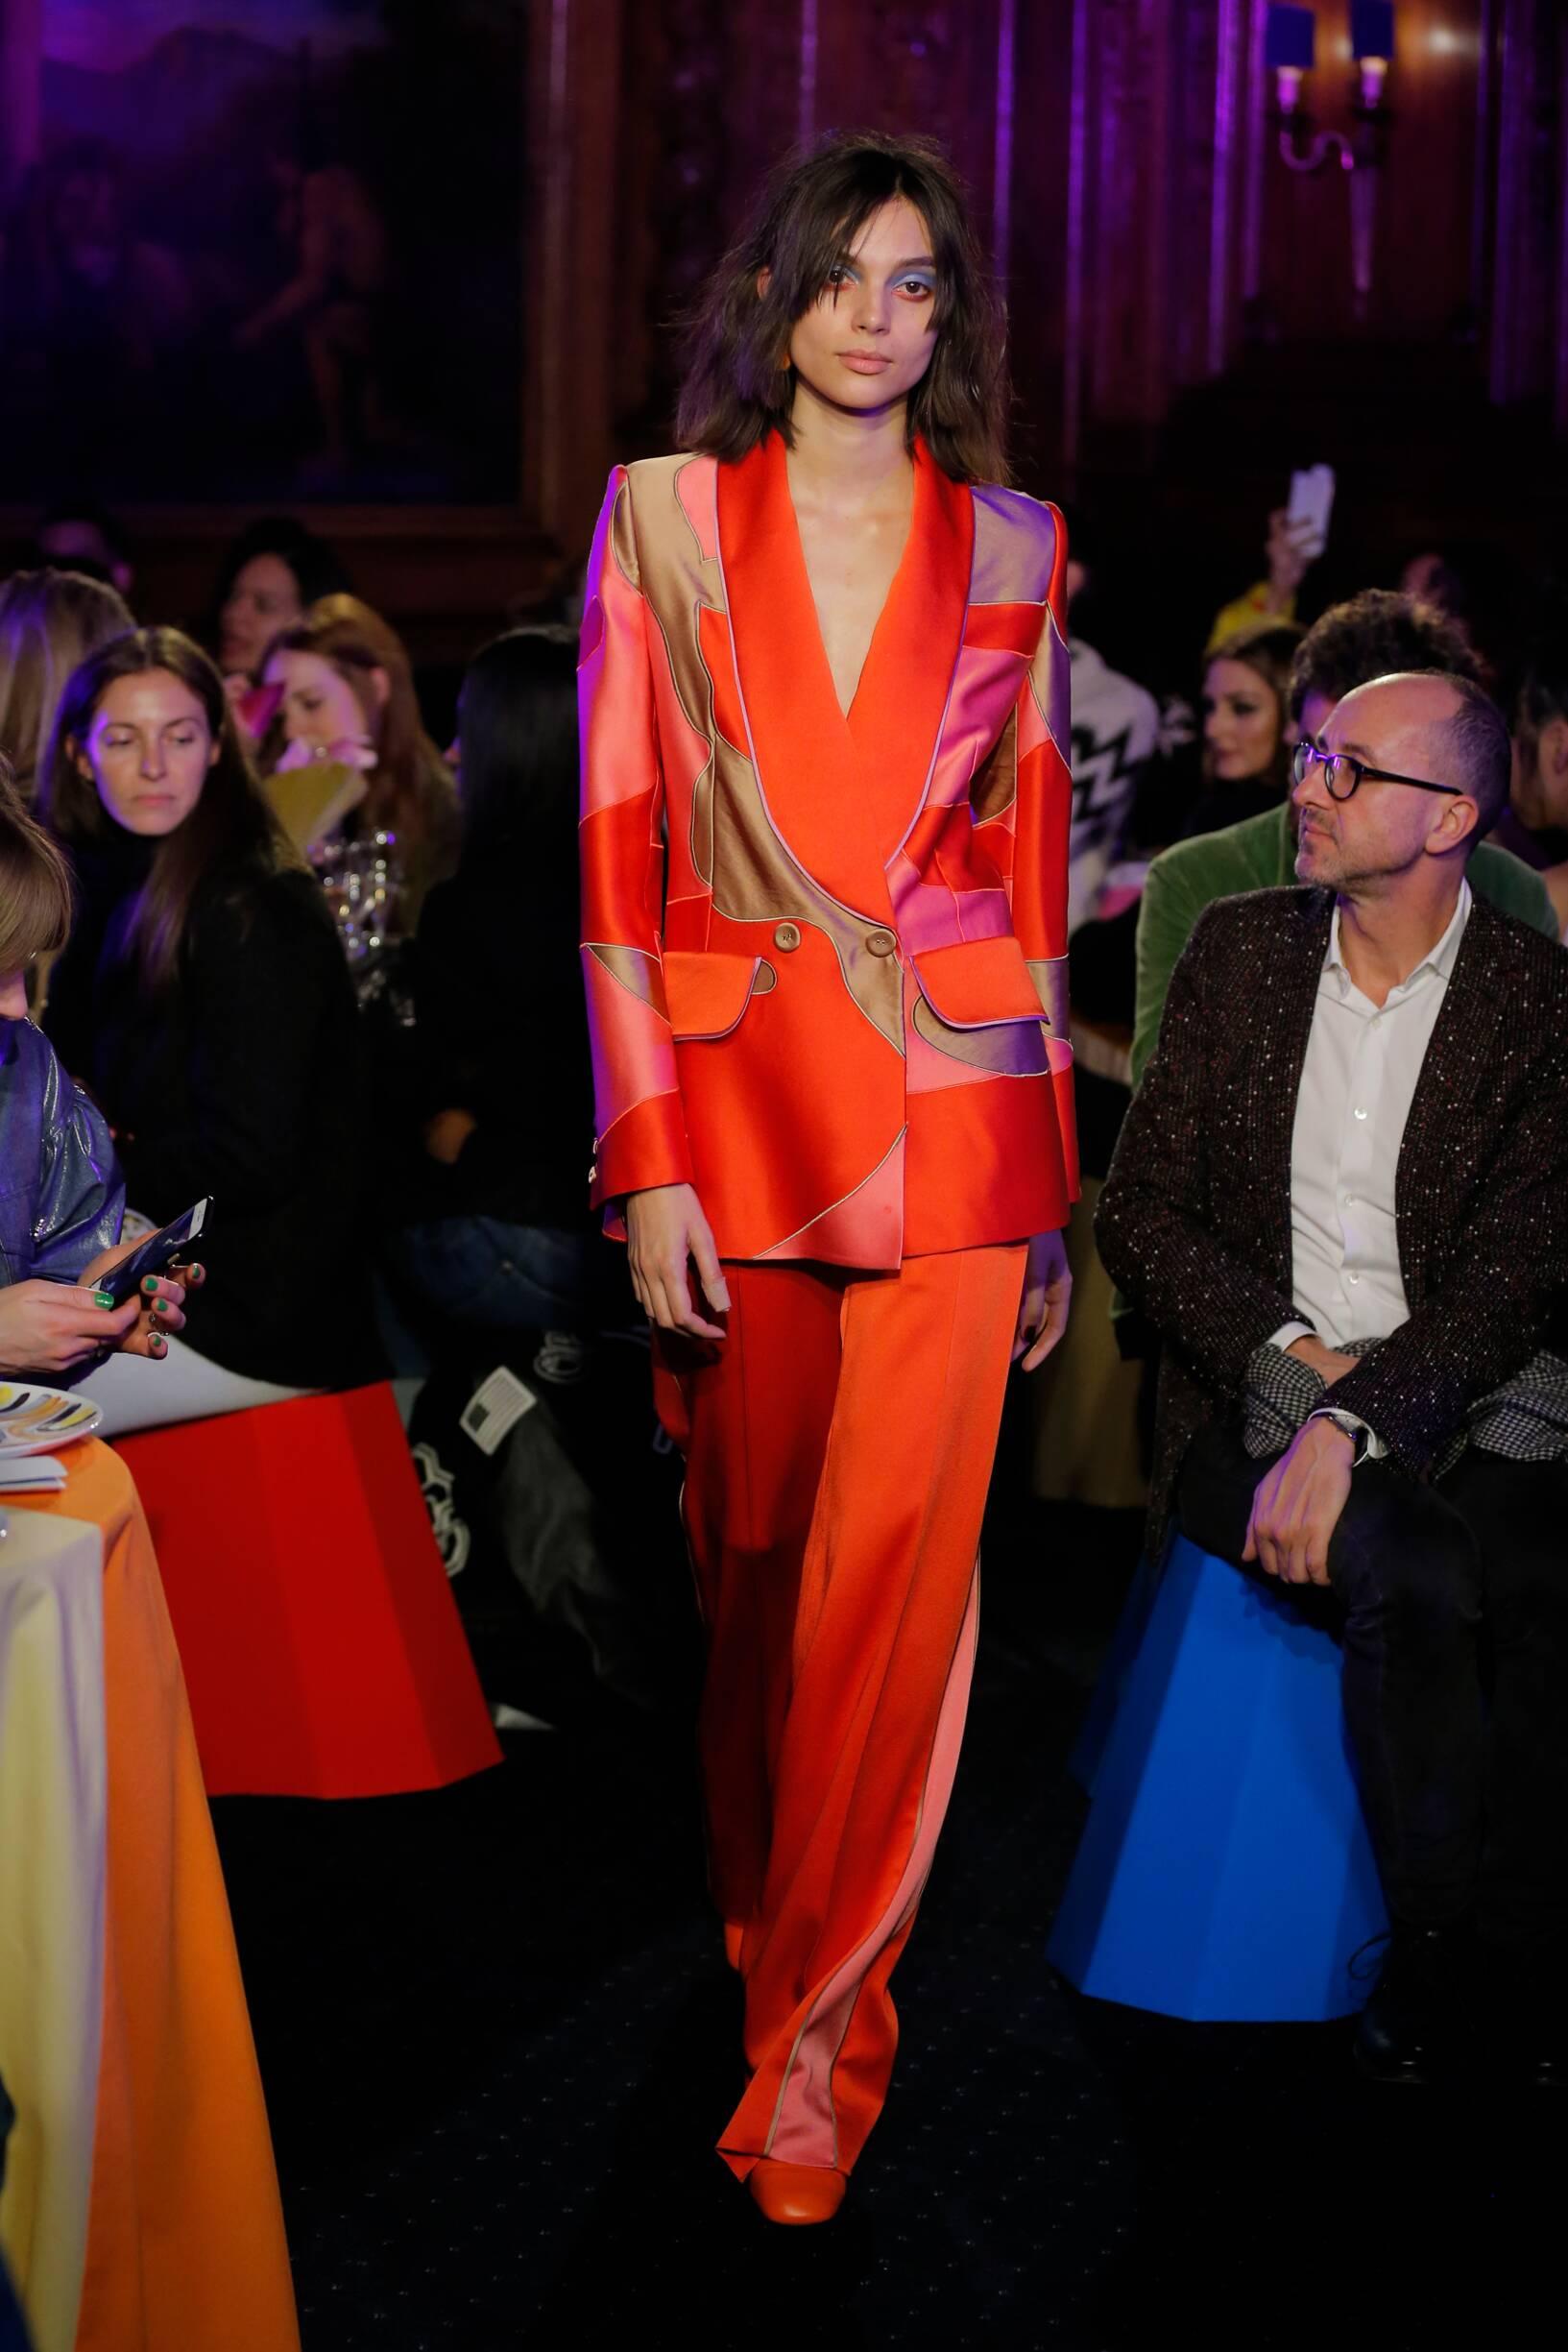 Woman FW 2018-19 Fashion Show Peter Pilotto